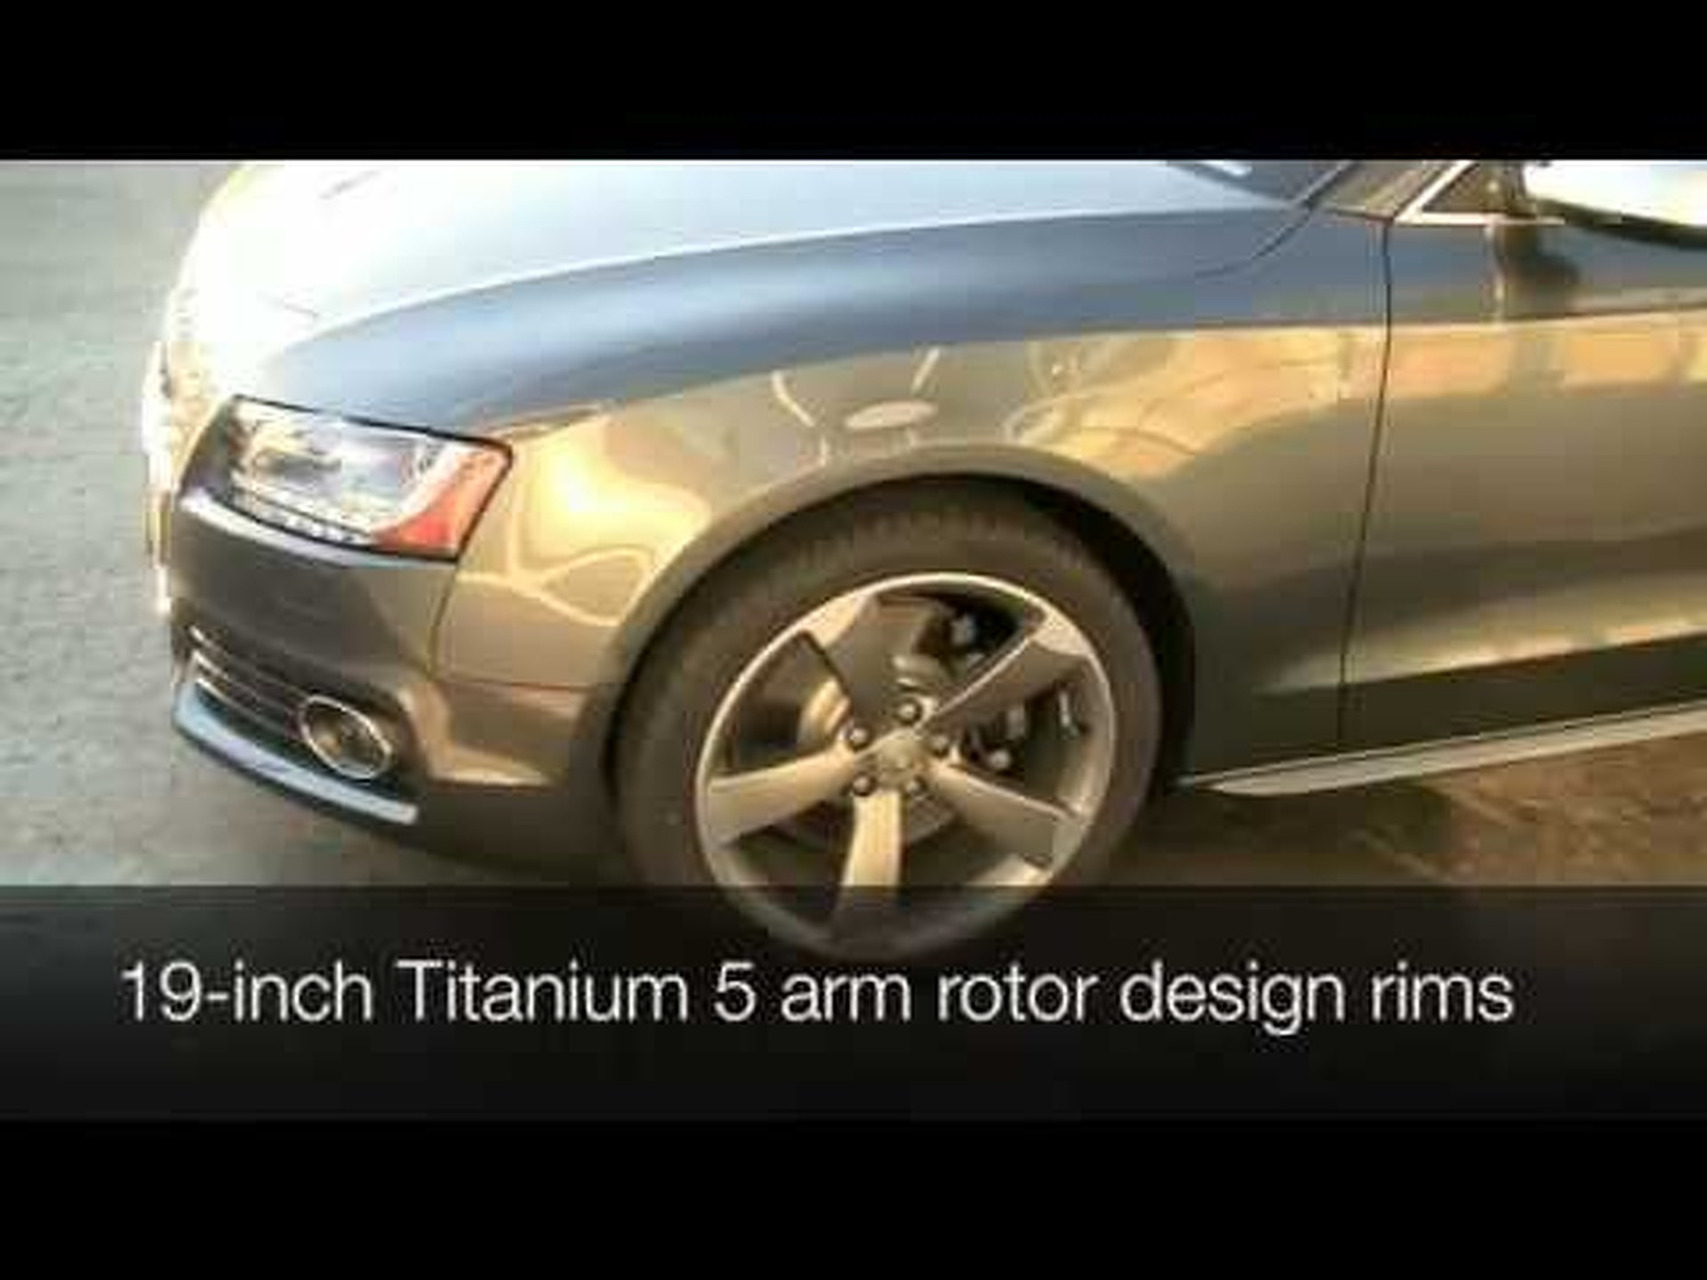 2012 Audi S5 4.2 Special Edition - Audi Exchange - Highland Park, IL - Quick Walk-around / Tour